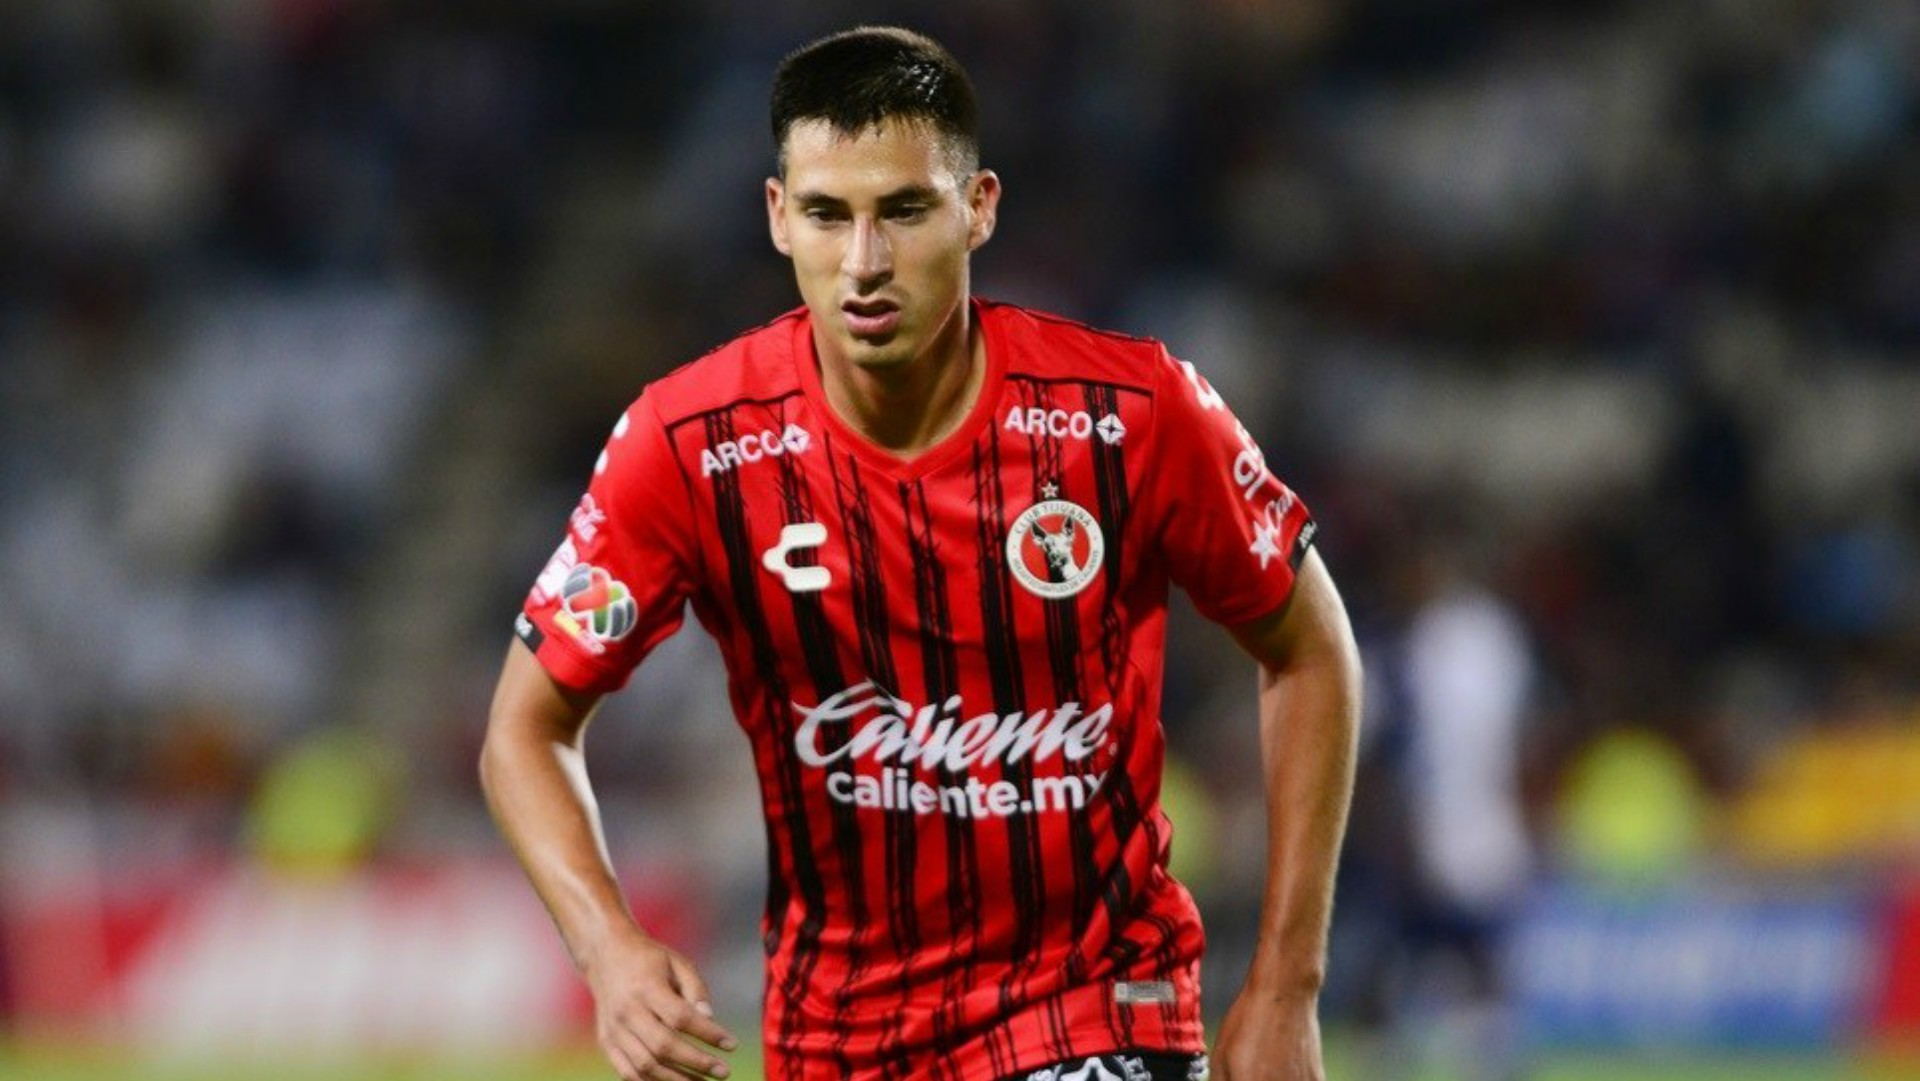 Chivas tendría interés en contratar a Mauro Lainez | Goal.com